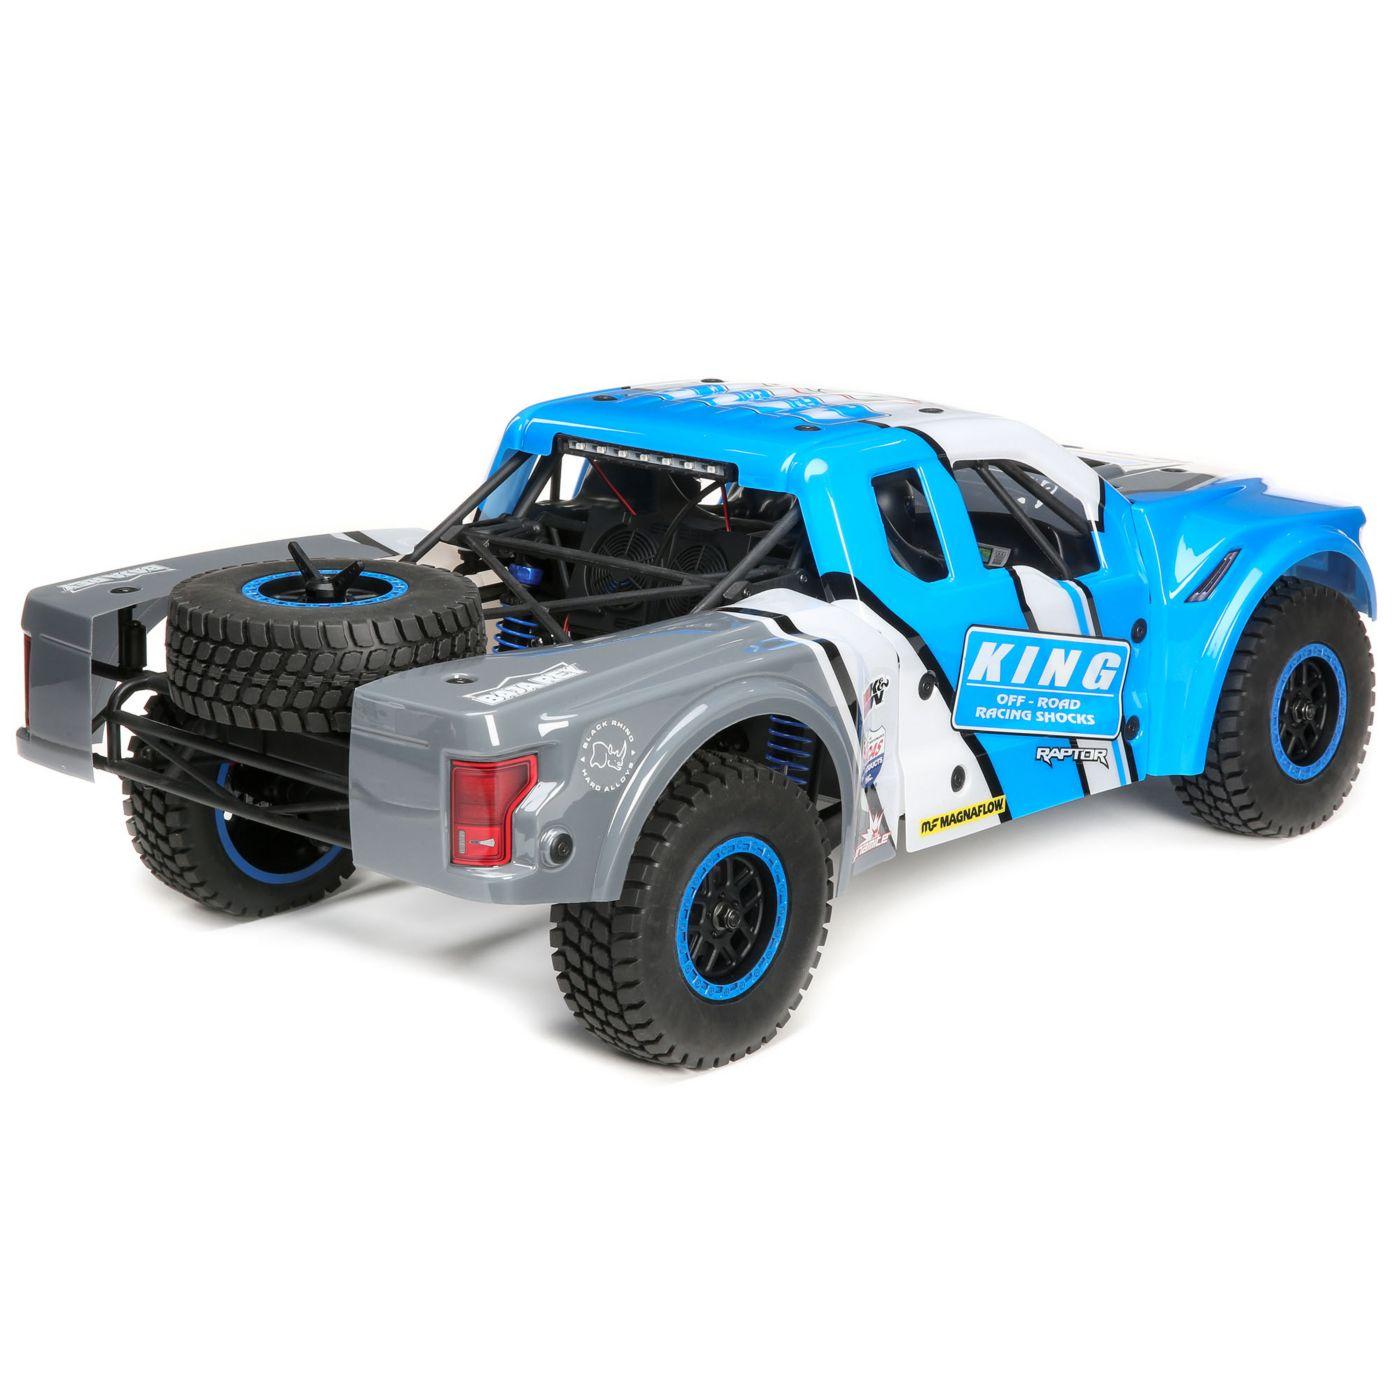 Losi Ford Raptor Baja Rey - Rear